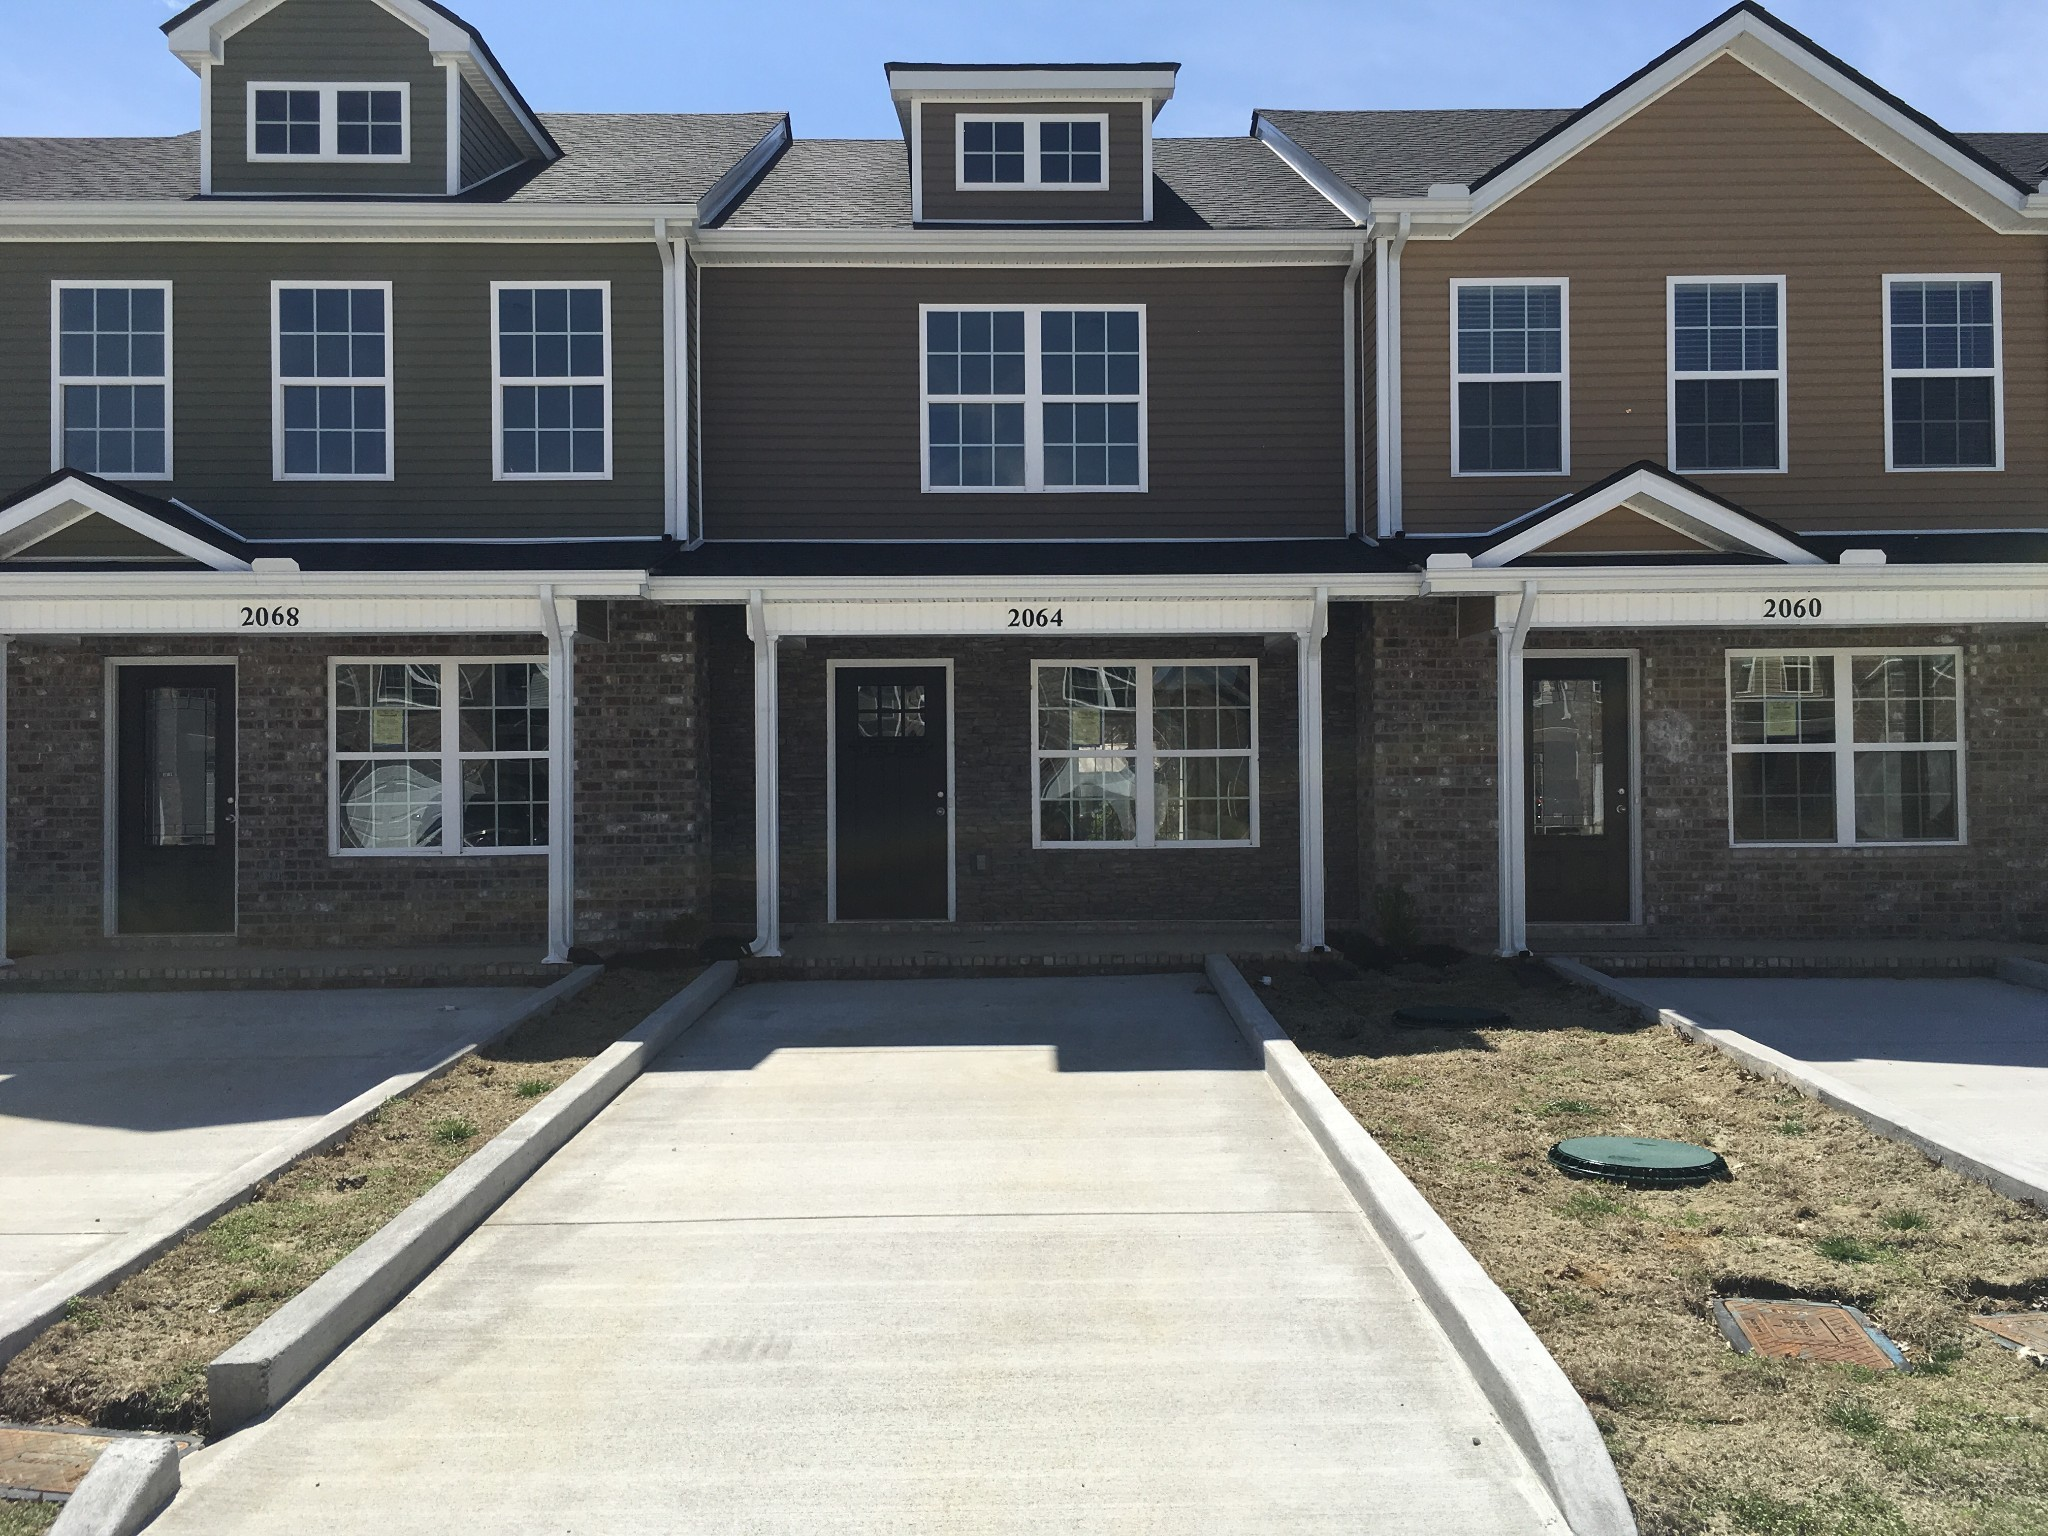 13 Unit 13 Bradley Bend Property Photo - Ashland City, TN real estate listing